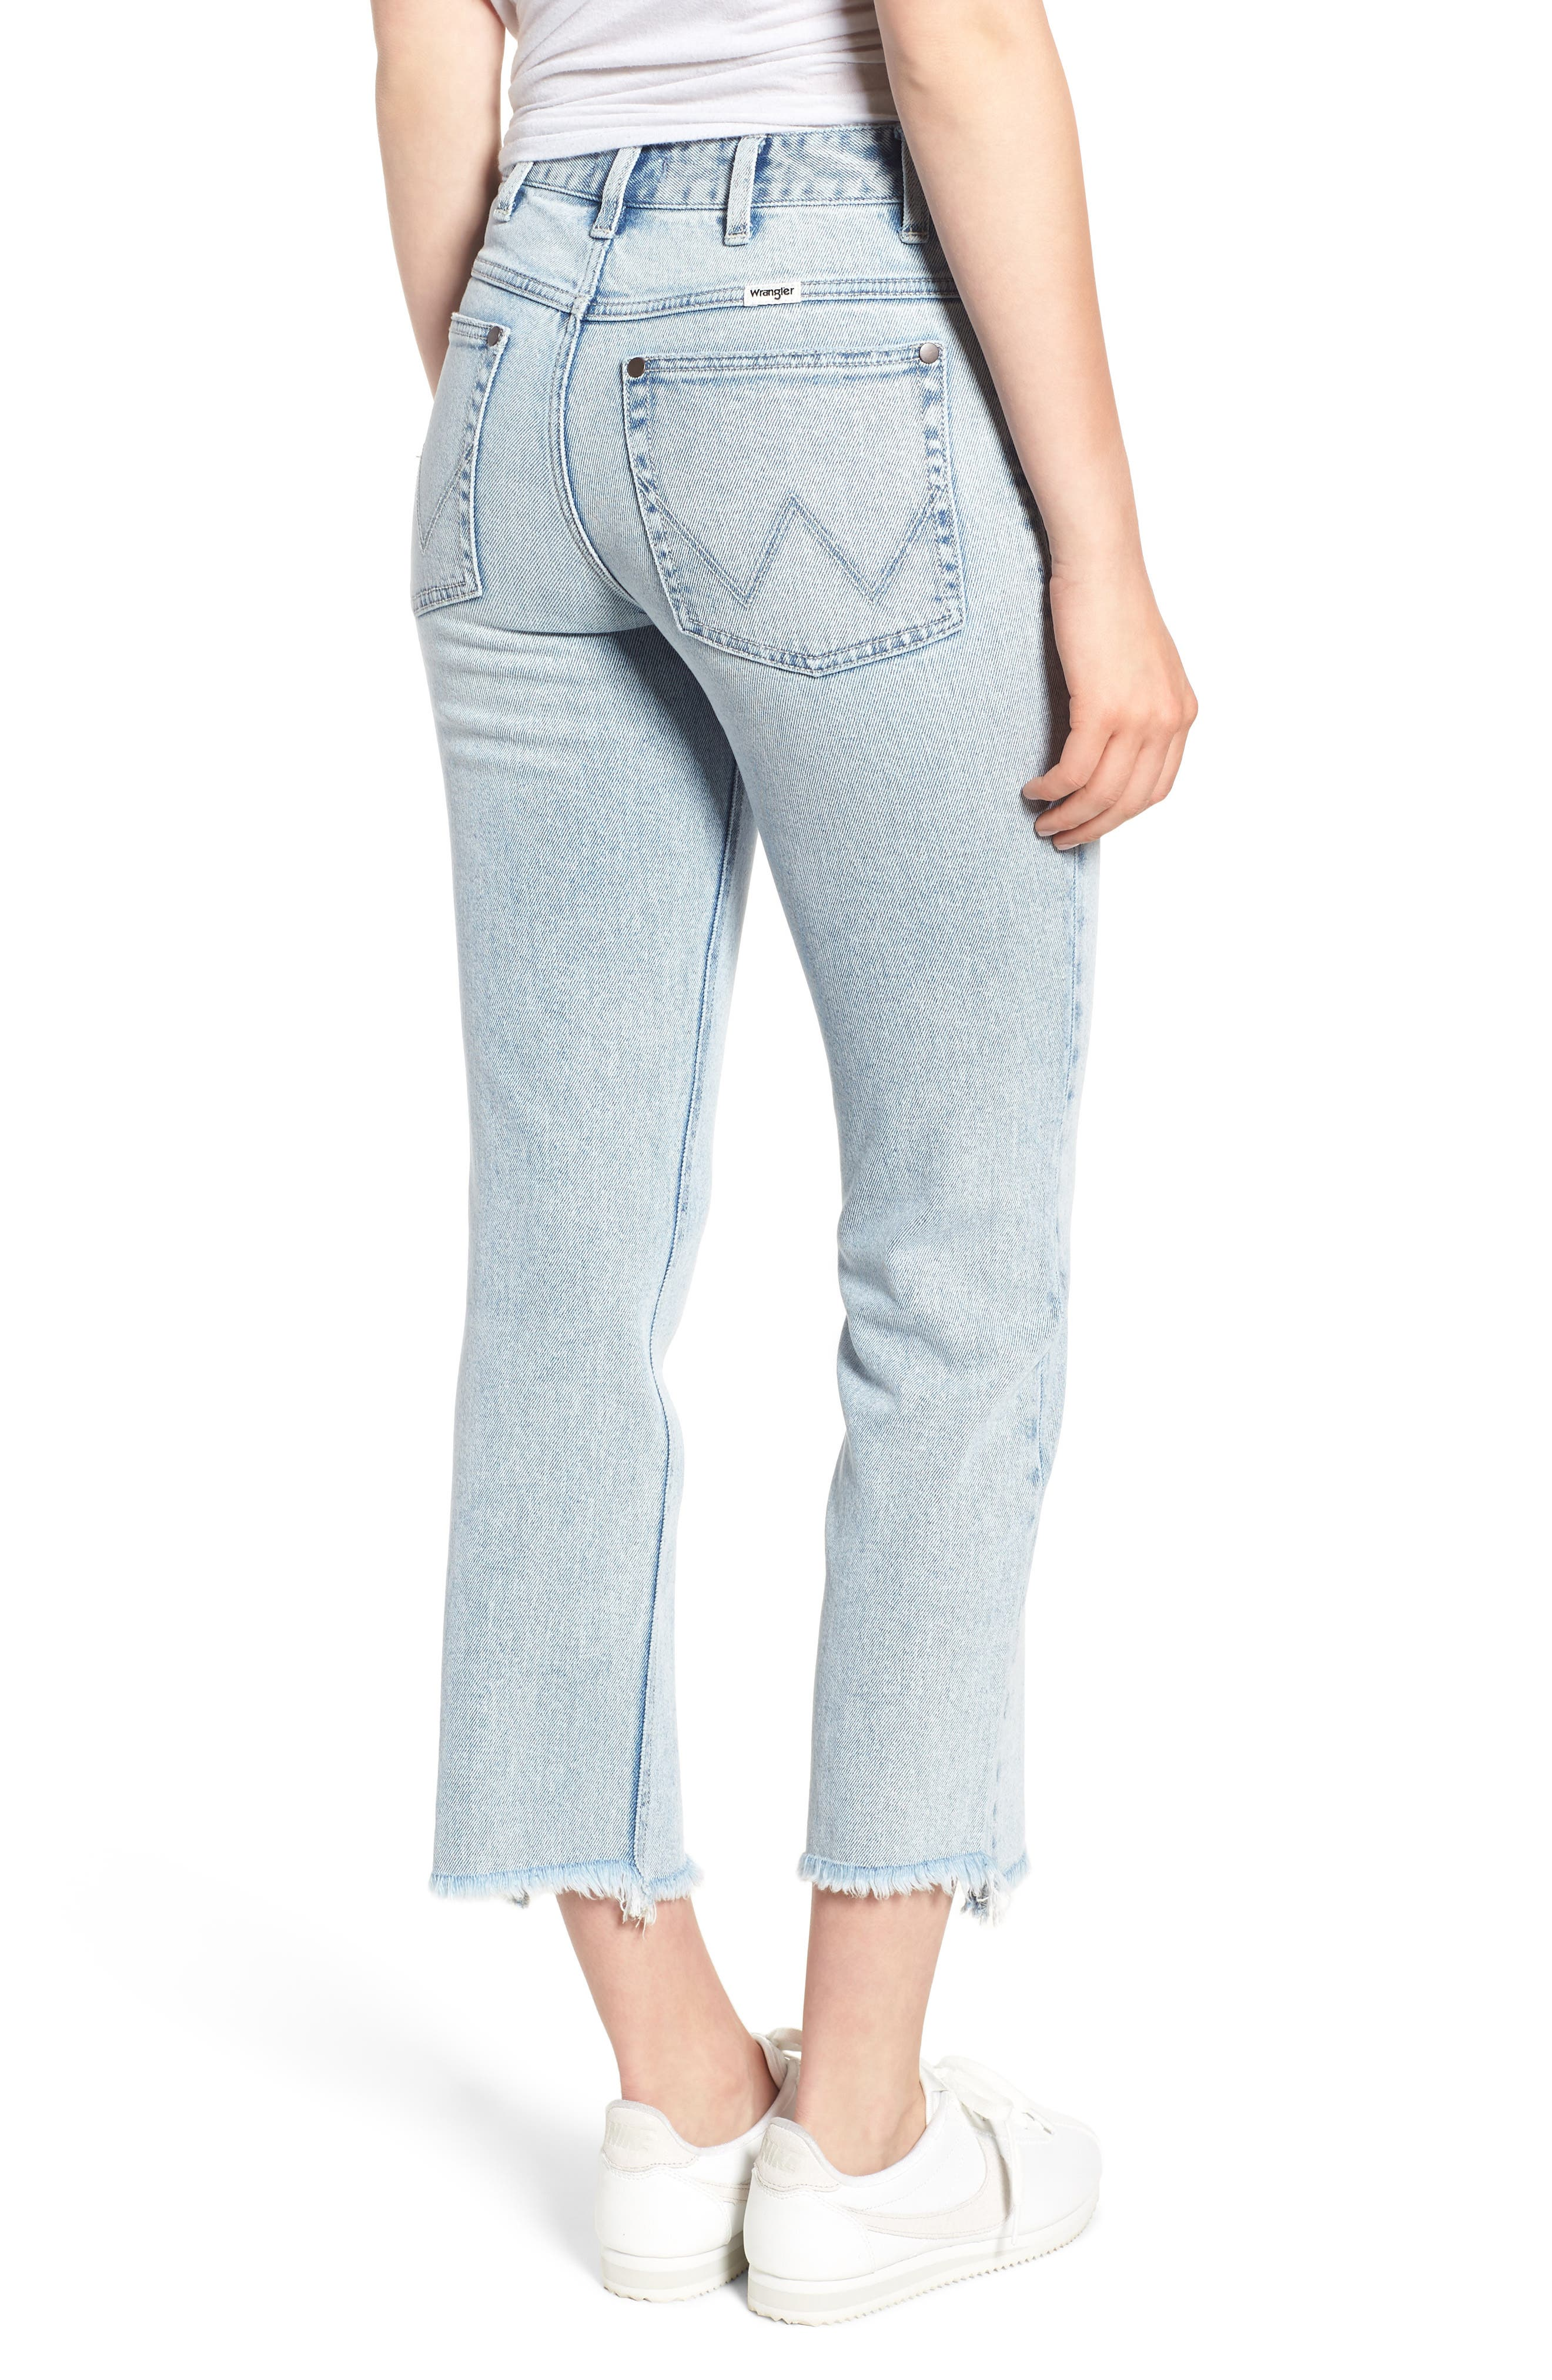 WRANGLER,                             Acid Wash High Waist Crop Jeans,                             Alternate thumbnail 2, color,                             454